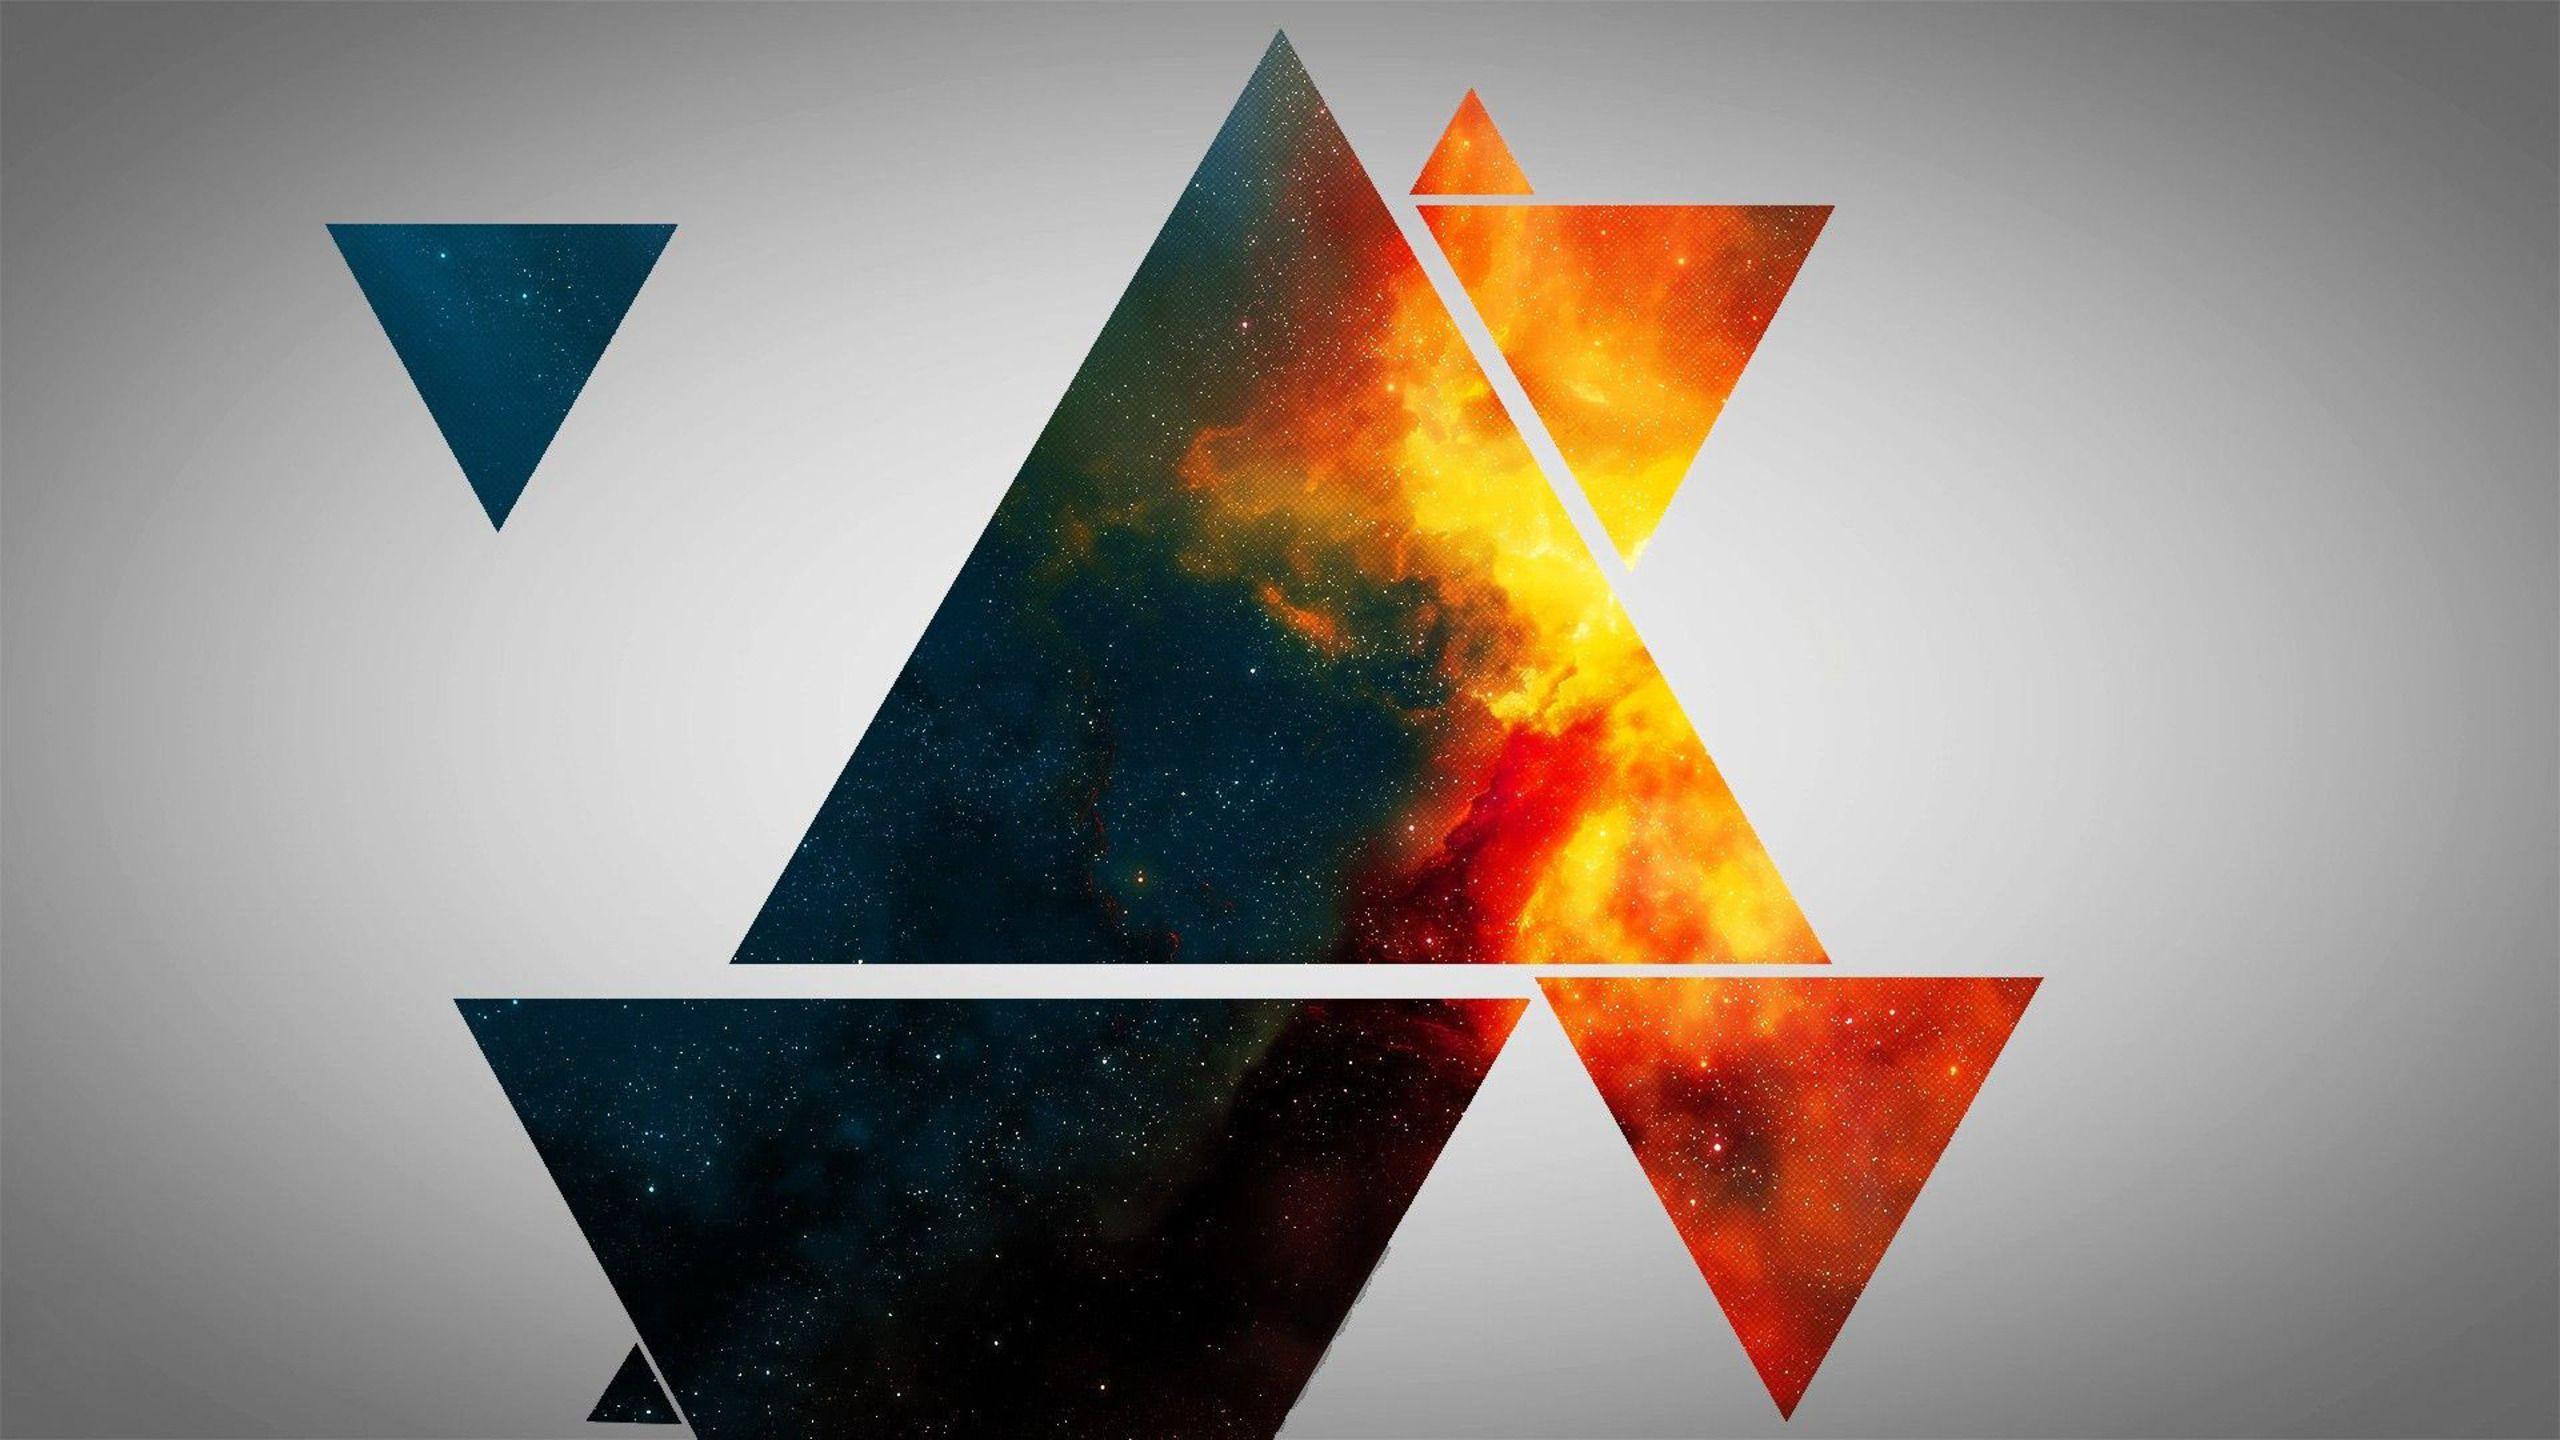 triangle background hd wallpaper - HD1920×1080